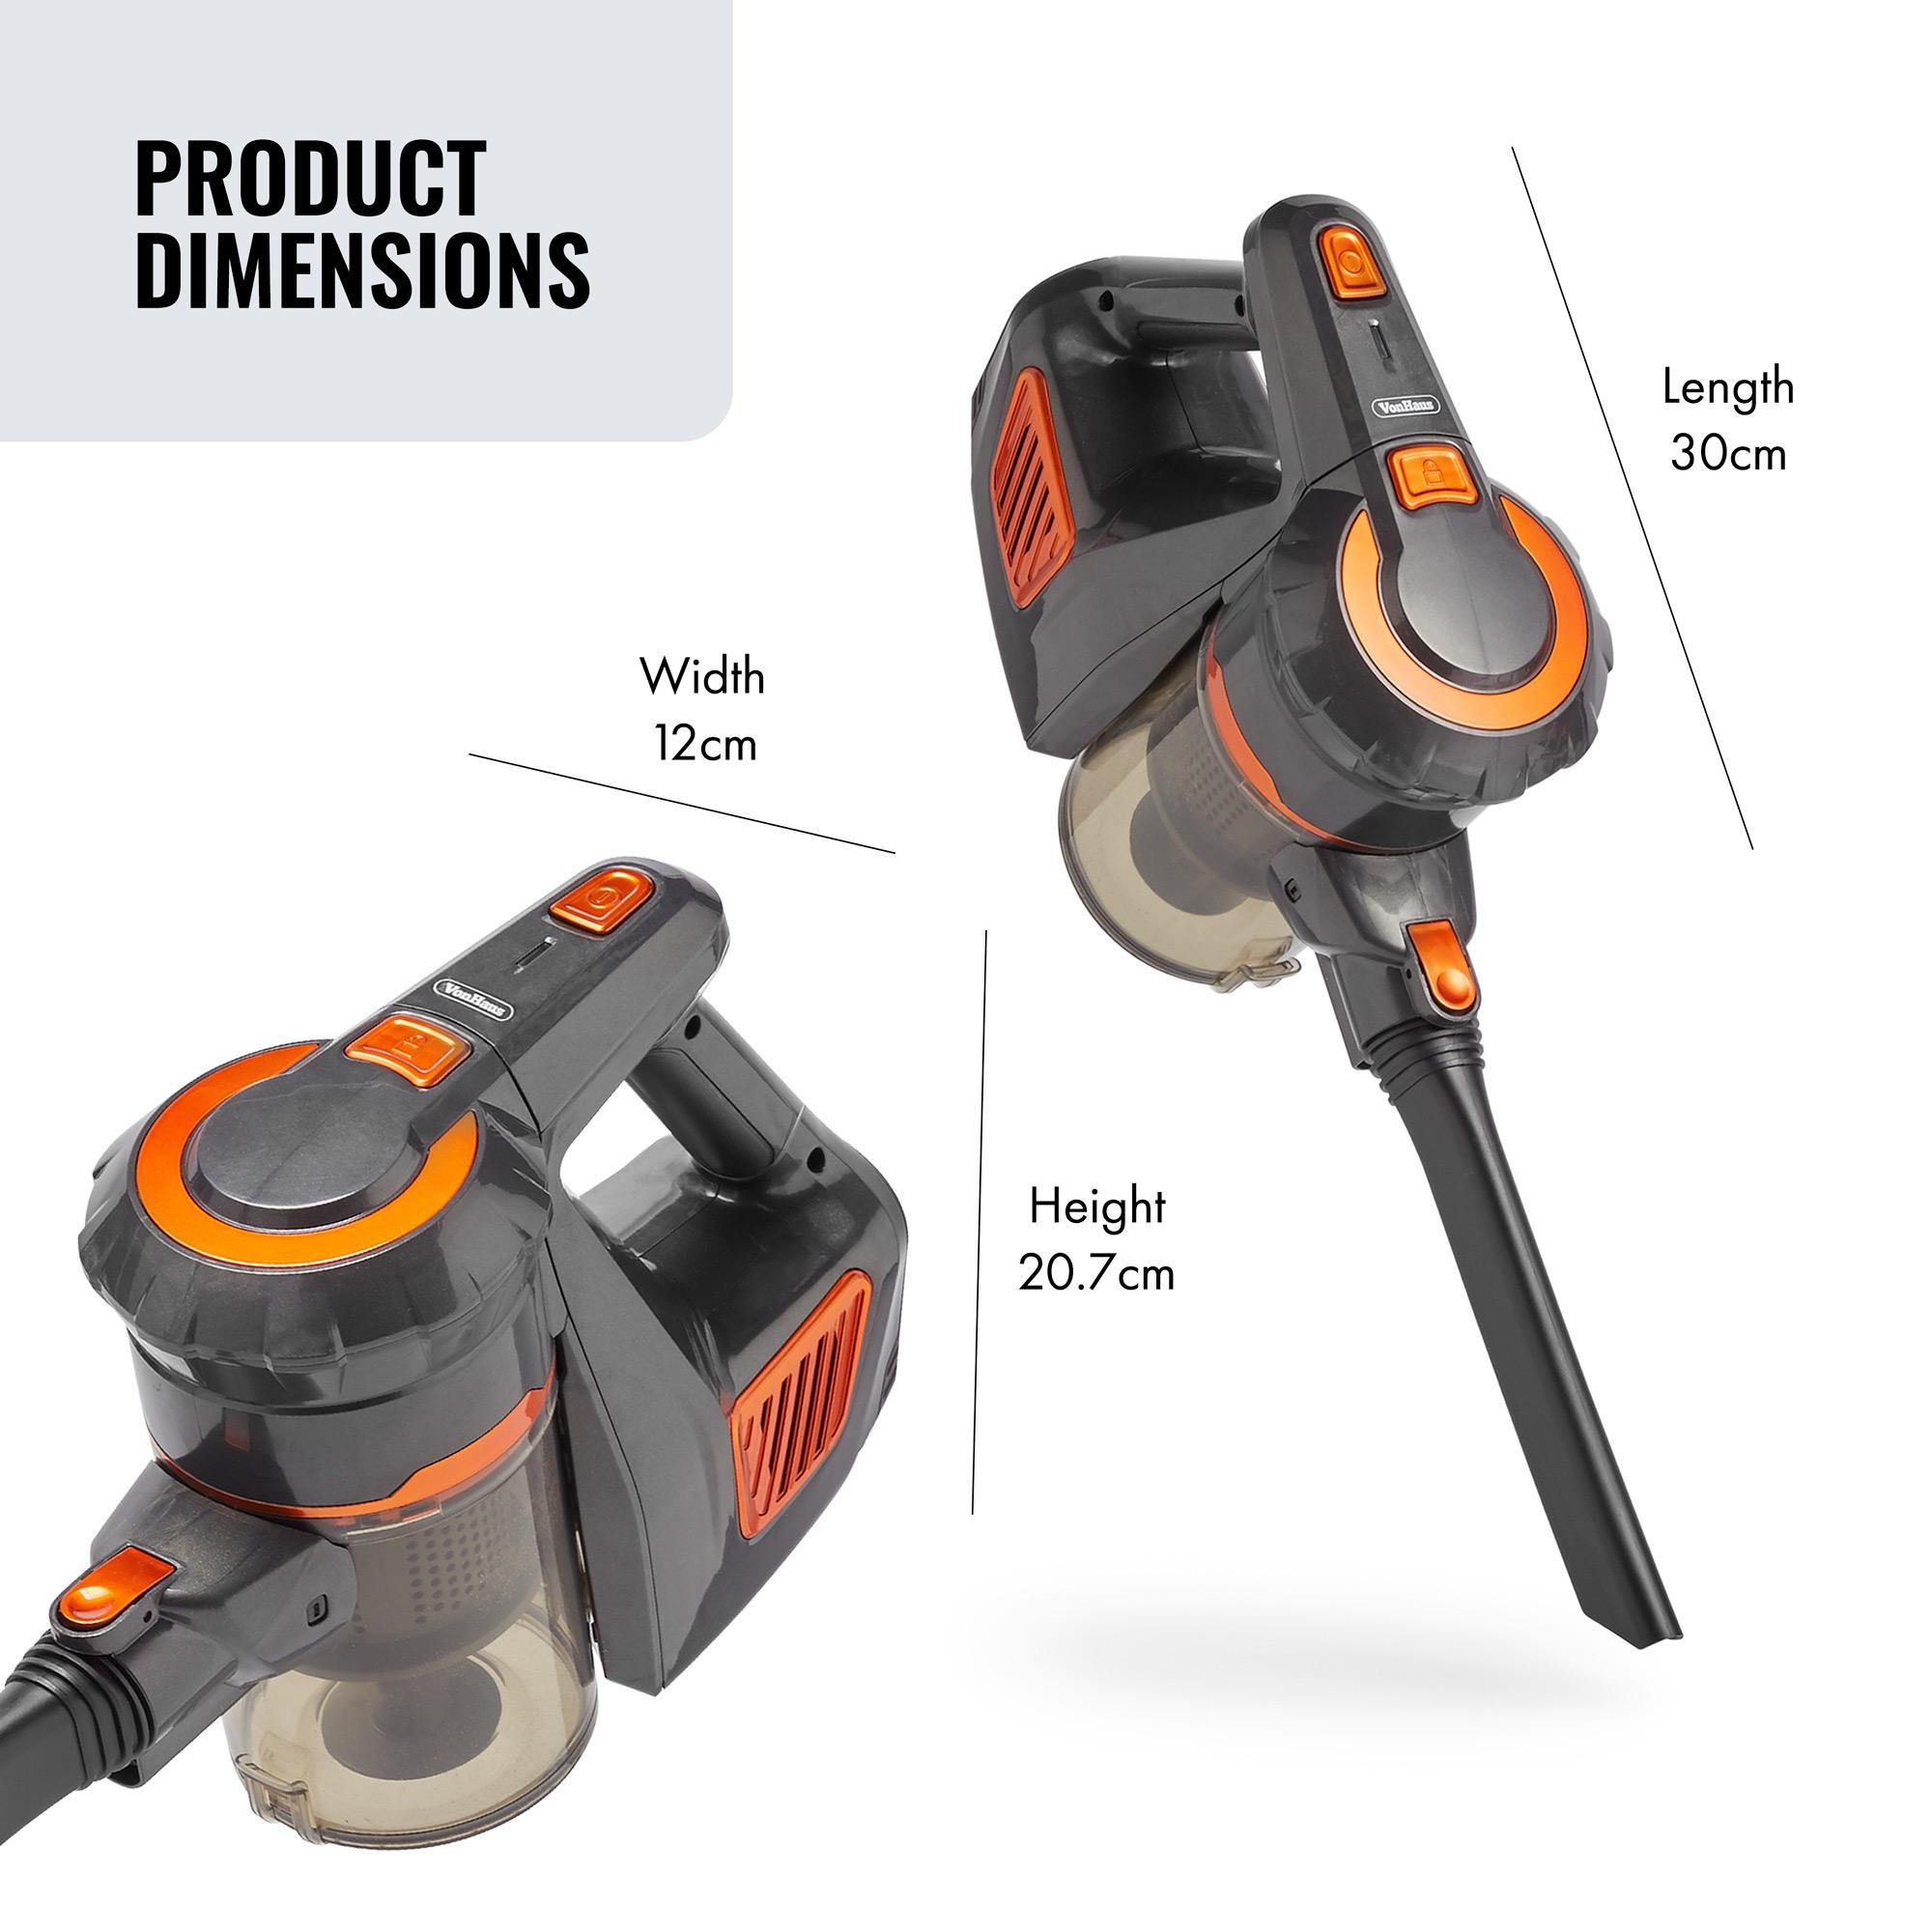 Vonhaus 2 In 1 Cordless Handheld Vacuum Cleaner Grey